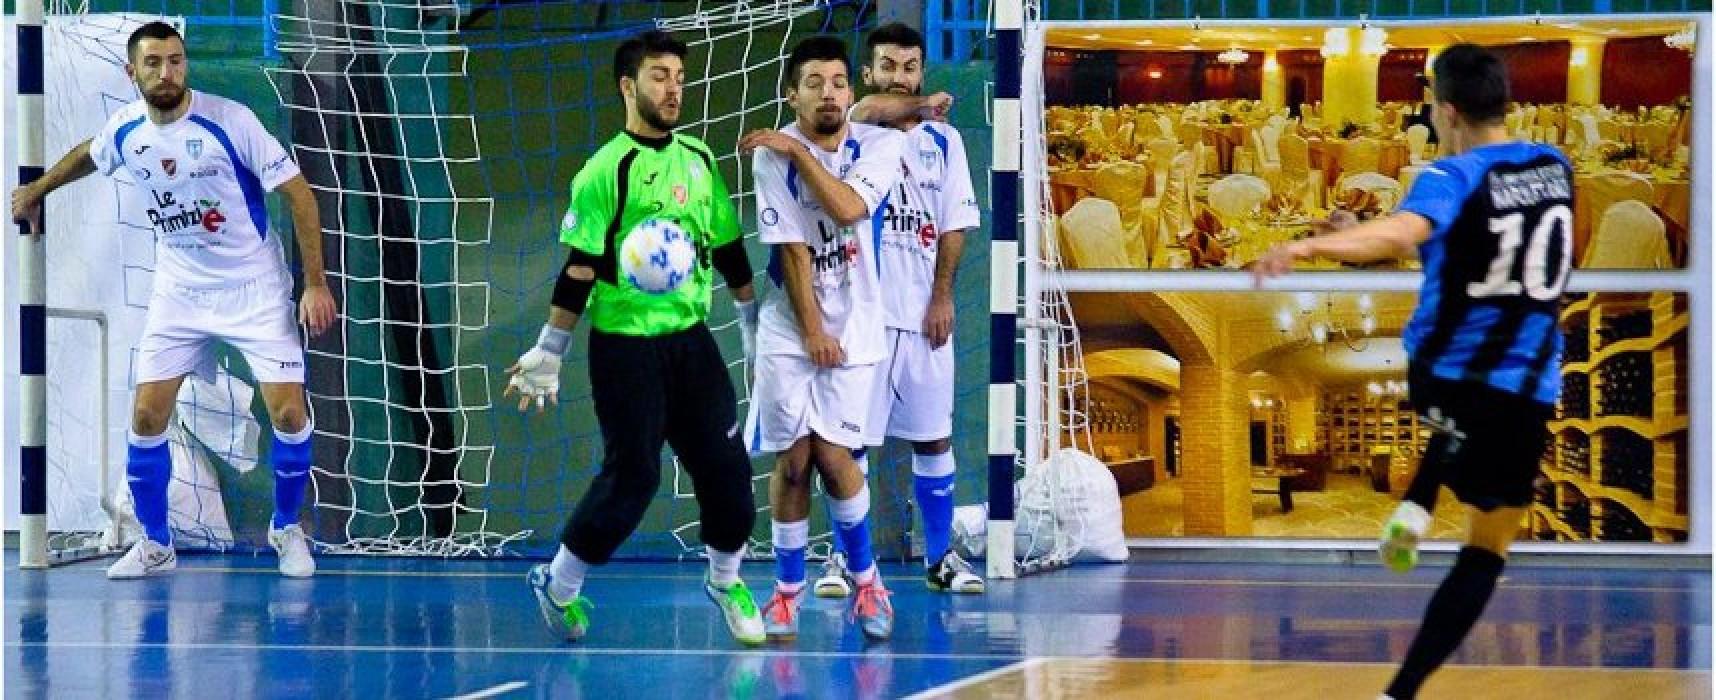 Guarda gli hightlights di Isernia-Futsal Bisceglie 3-3/VIDEO